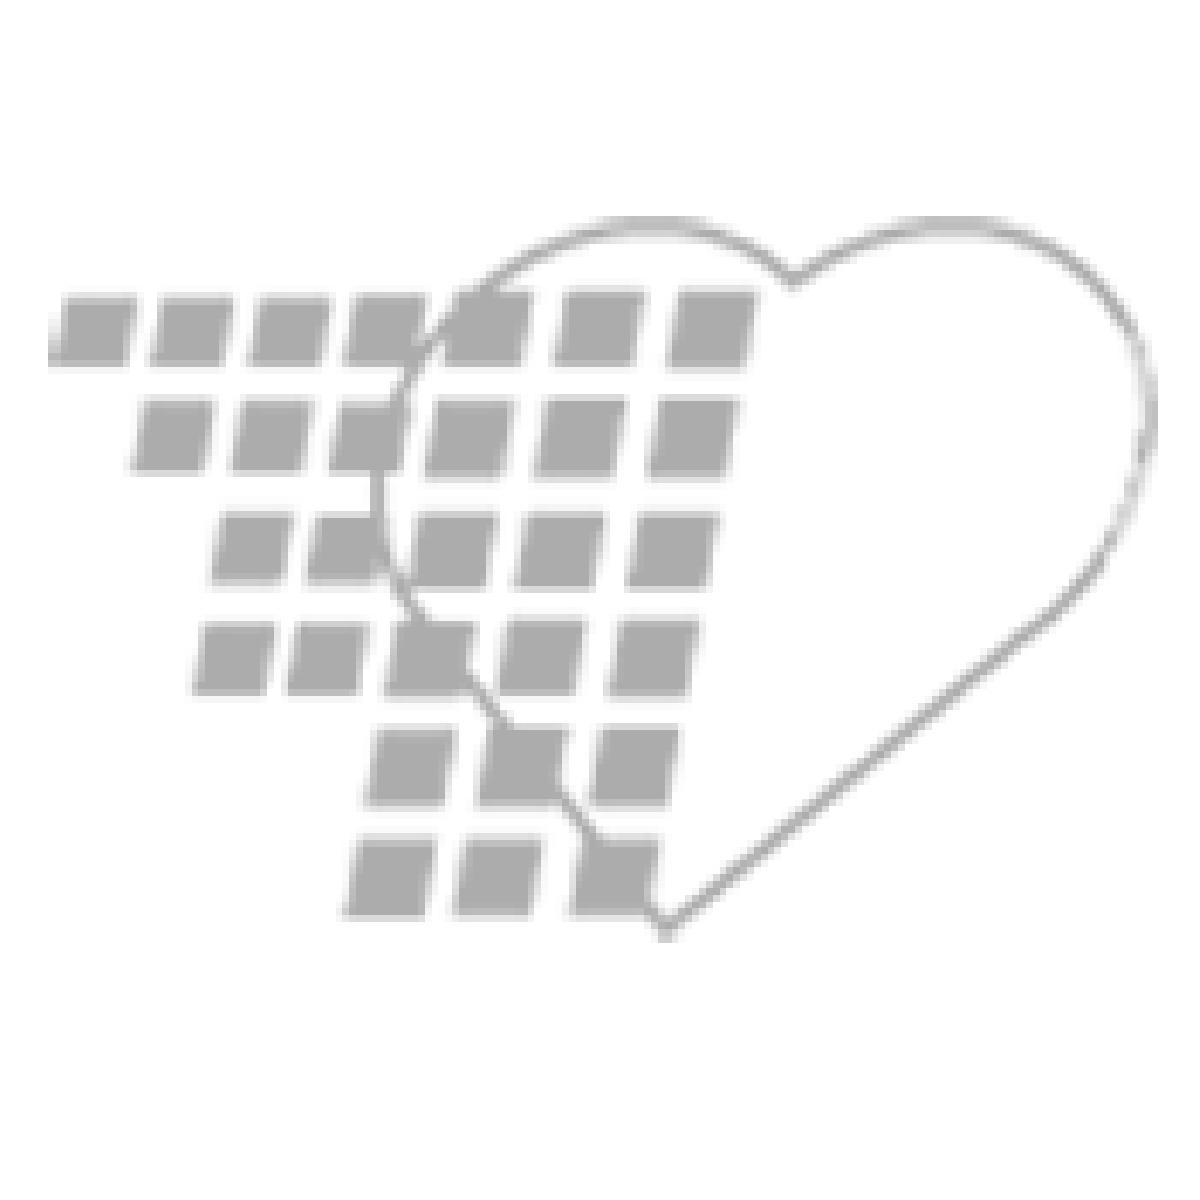 06-93-1202 Demo Dose® Amoxicilln Clavulanc acd Augmentn 100 mL 400 mg/5 mL